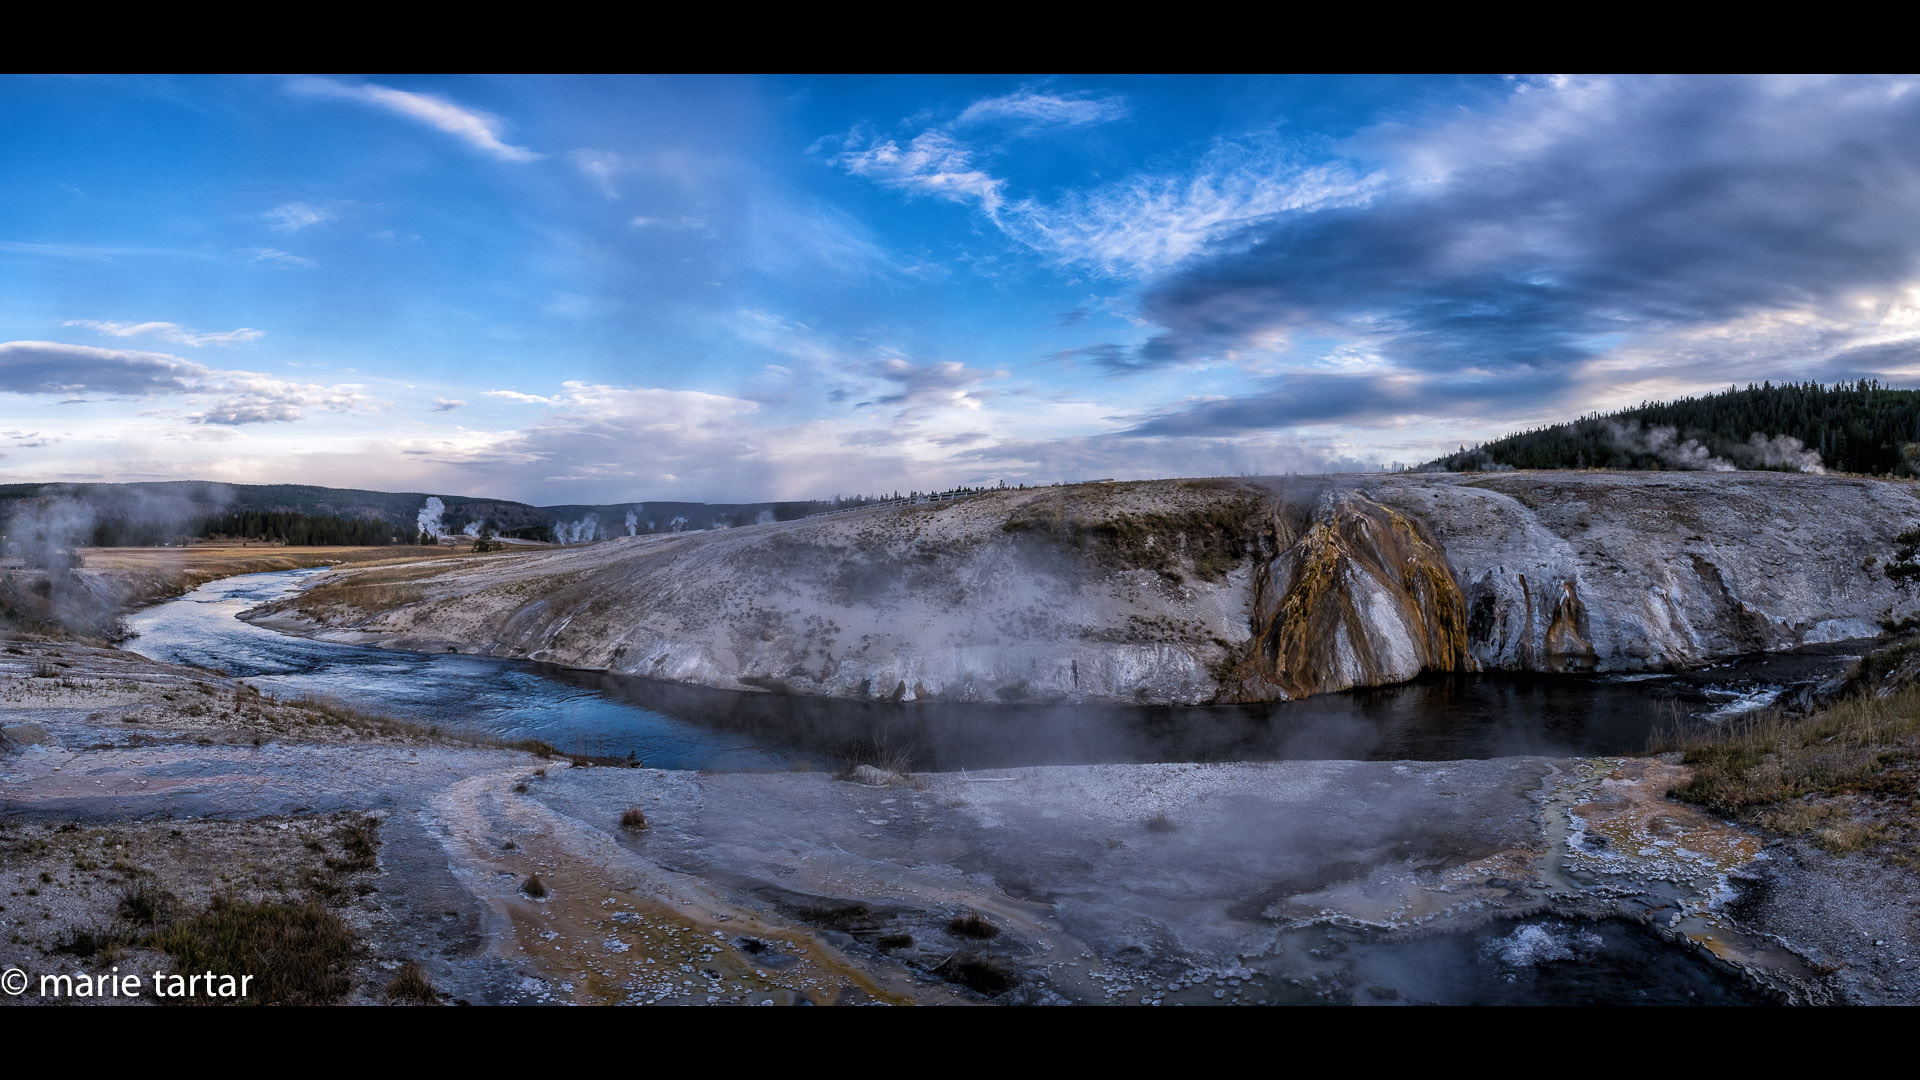 201509_Marie_Tartar_Yellowstone_pano1